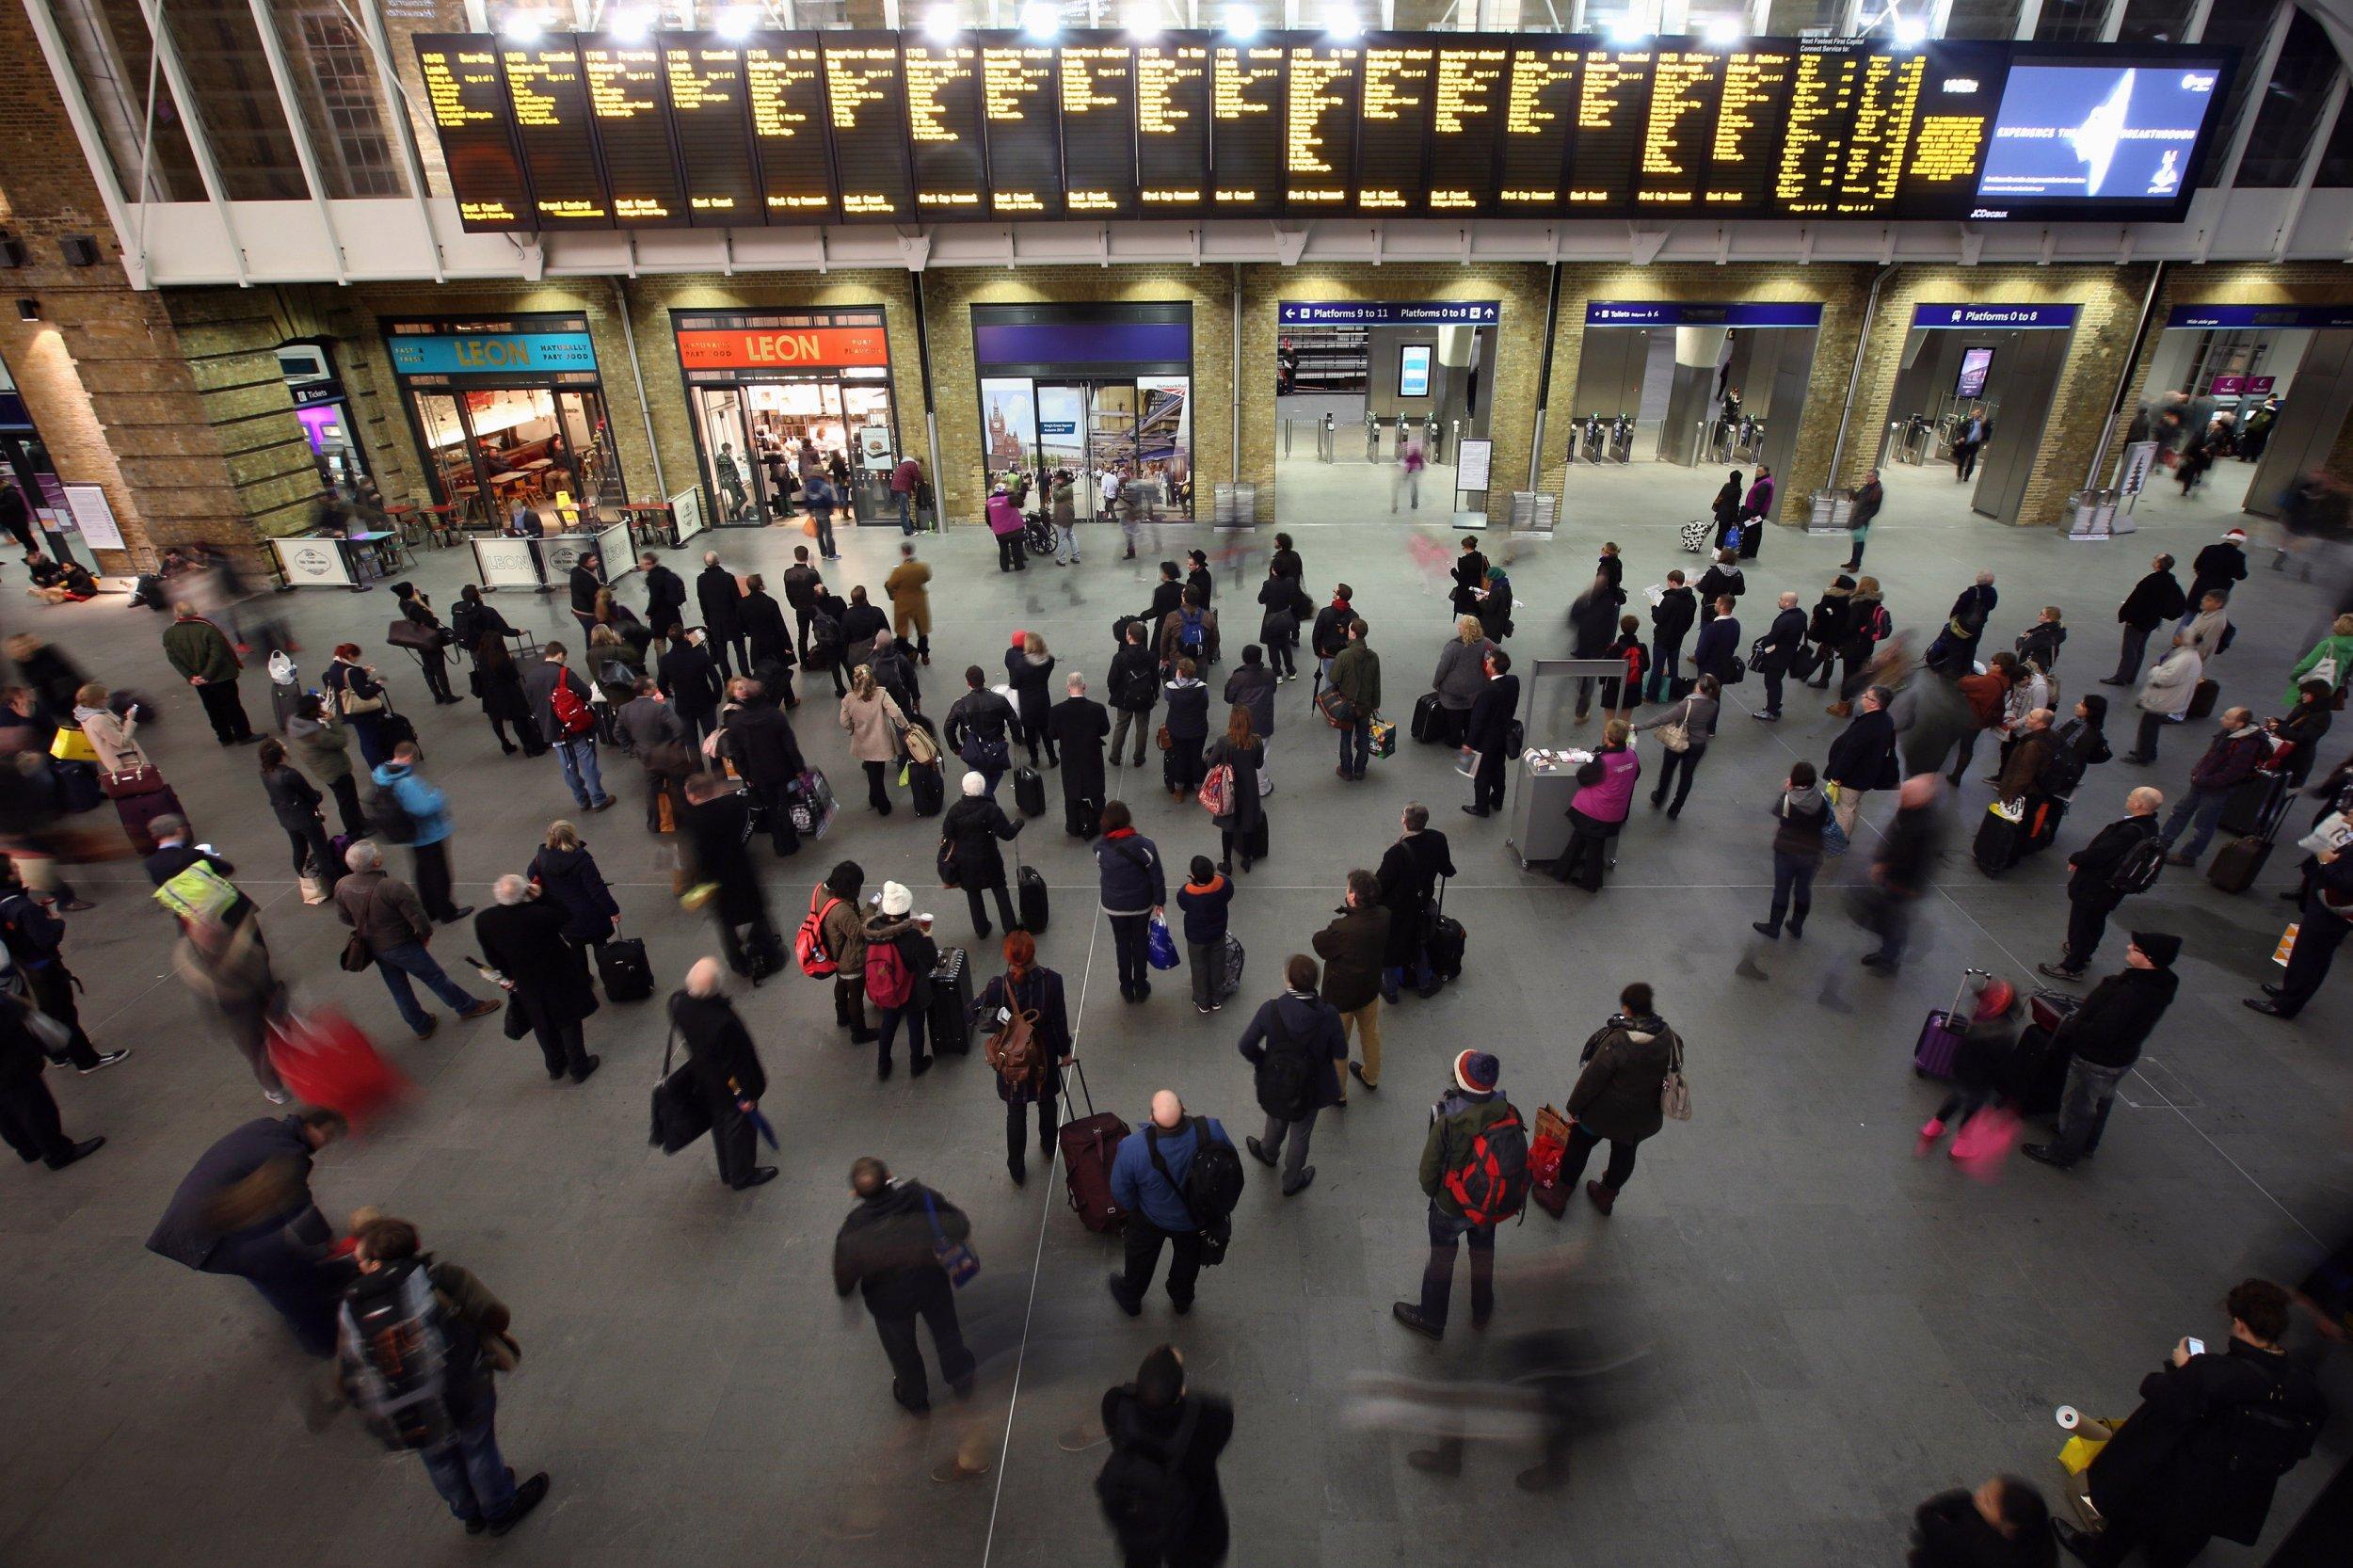 Passengers in King's Cross station